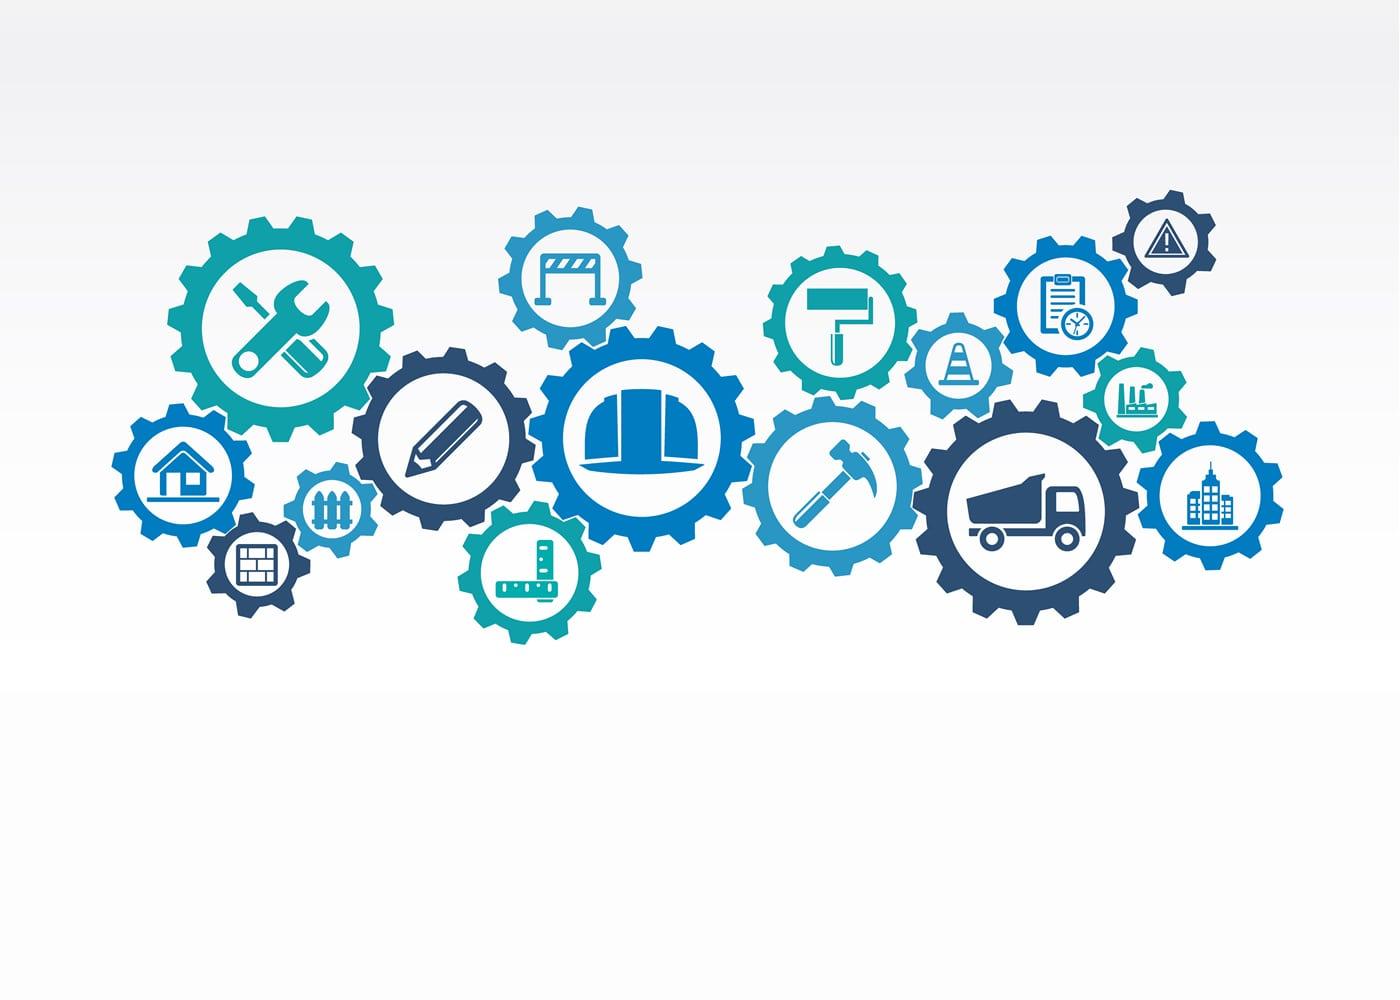 naem-research-quickpolls-2016-06-environmental-remediation-management-programs-700x500